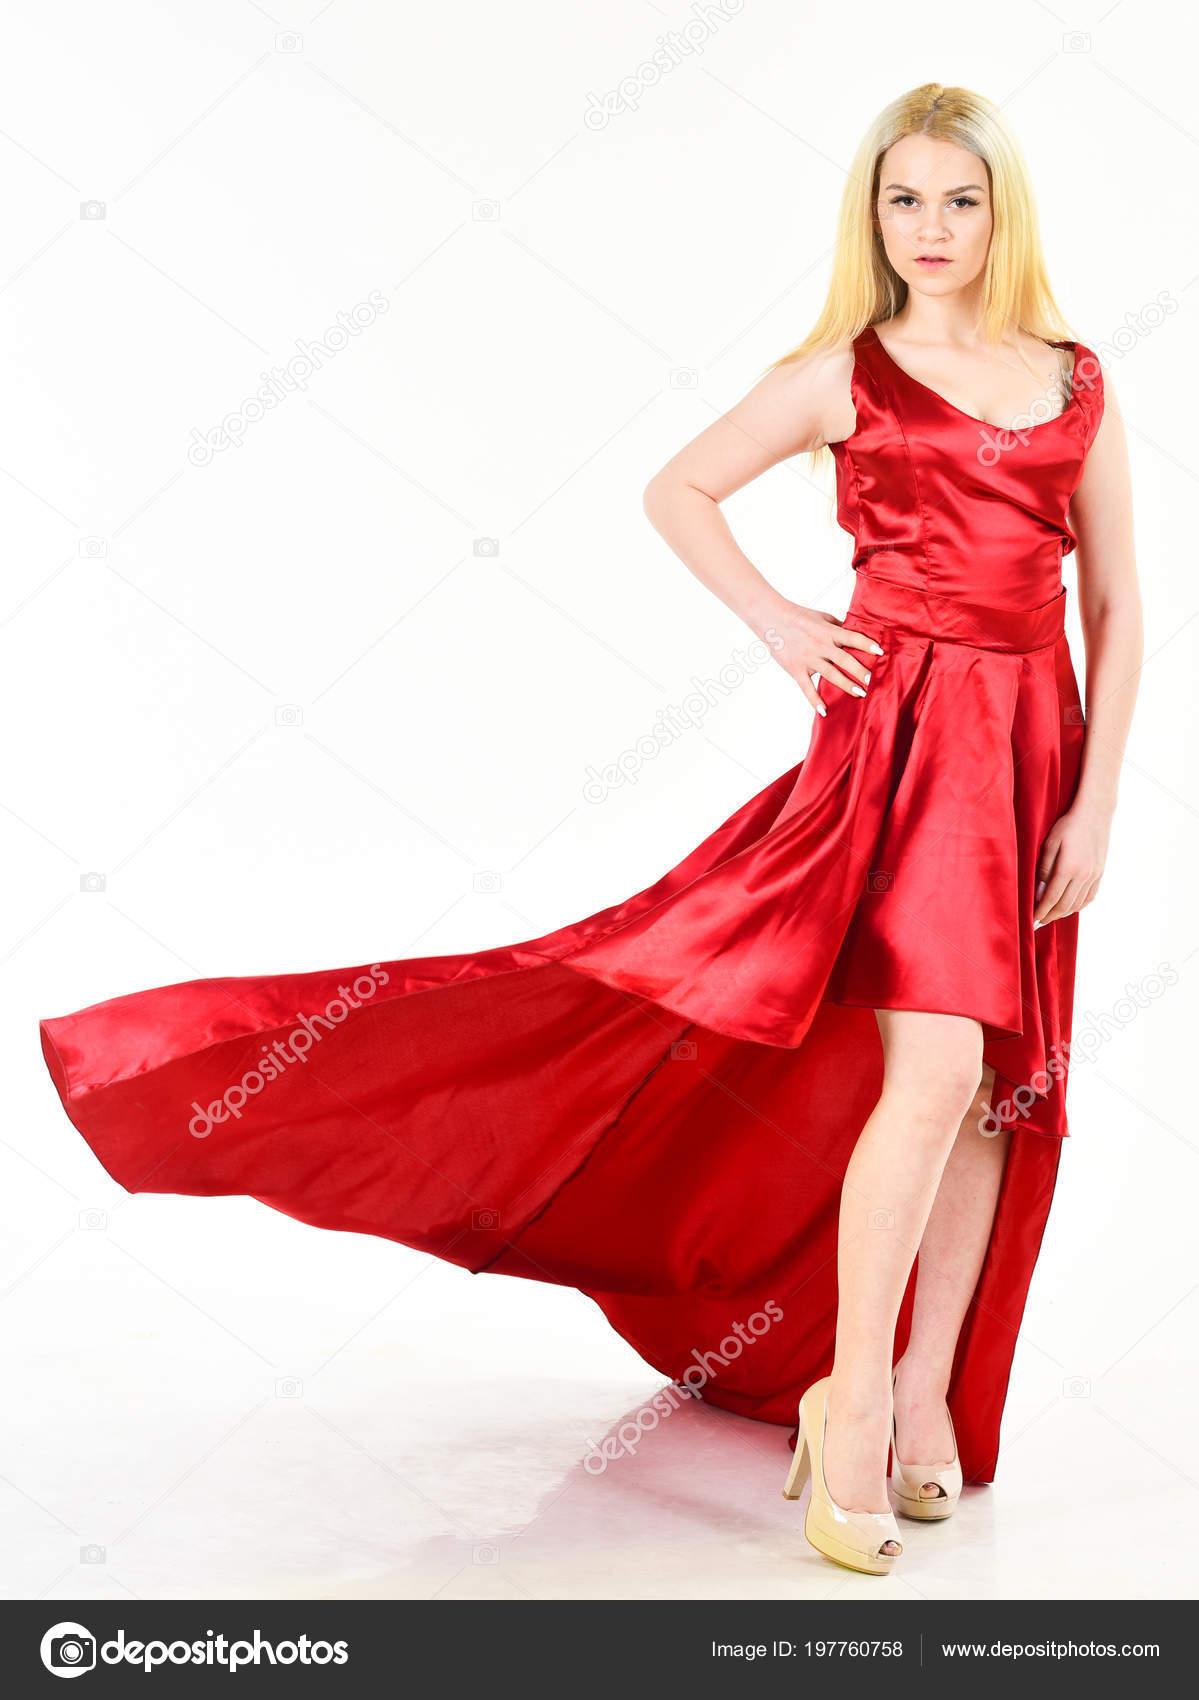 ea528edf4c1ccd Vrouw draagt elegante avond rode jurk